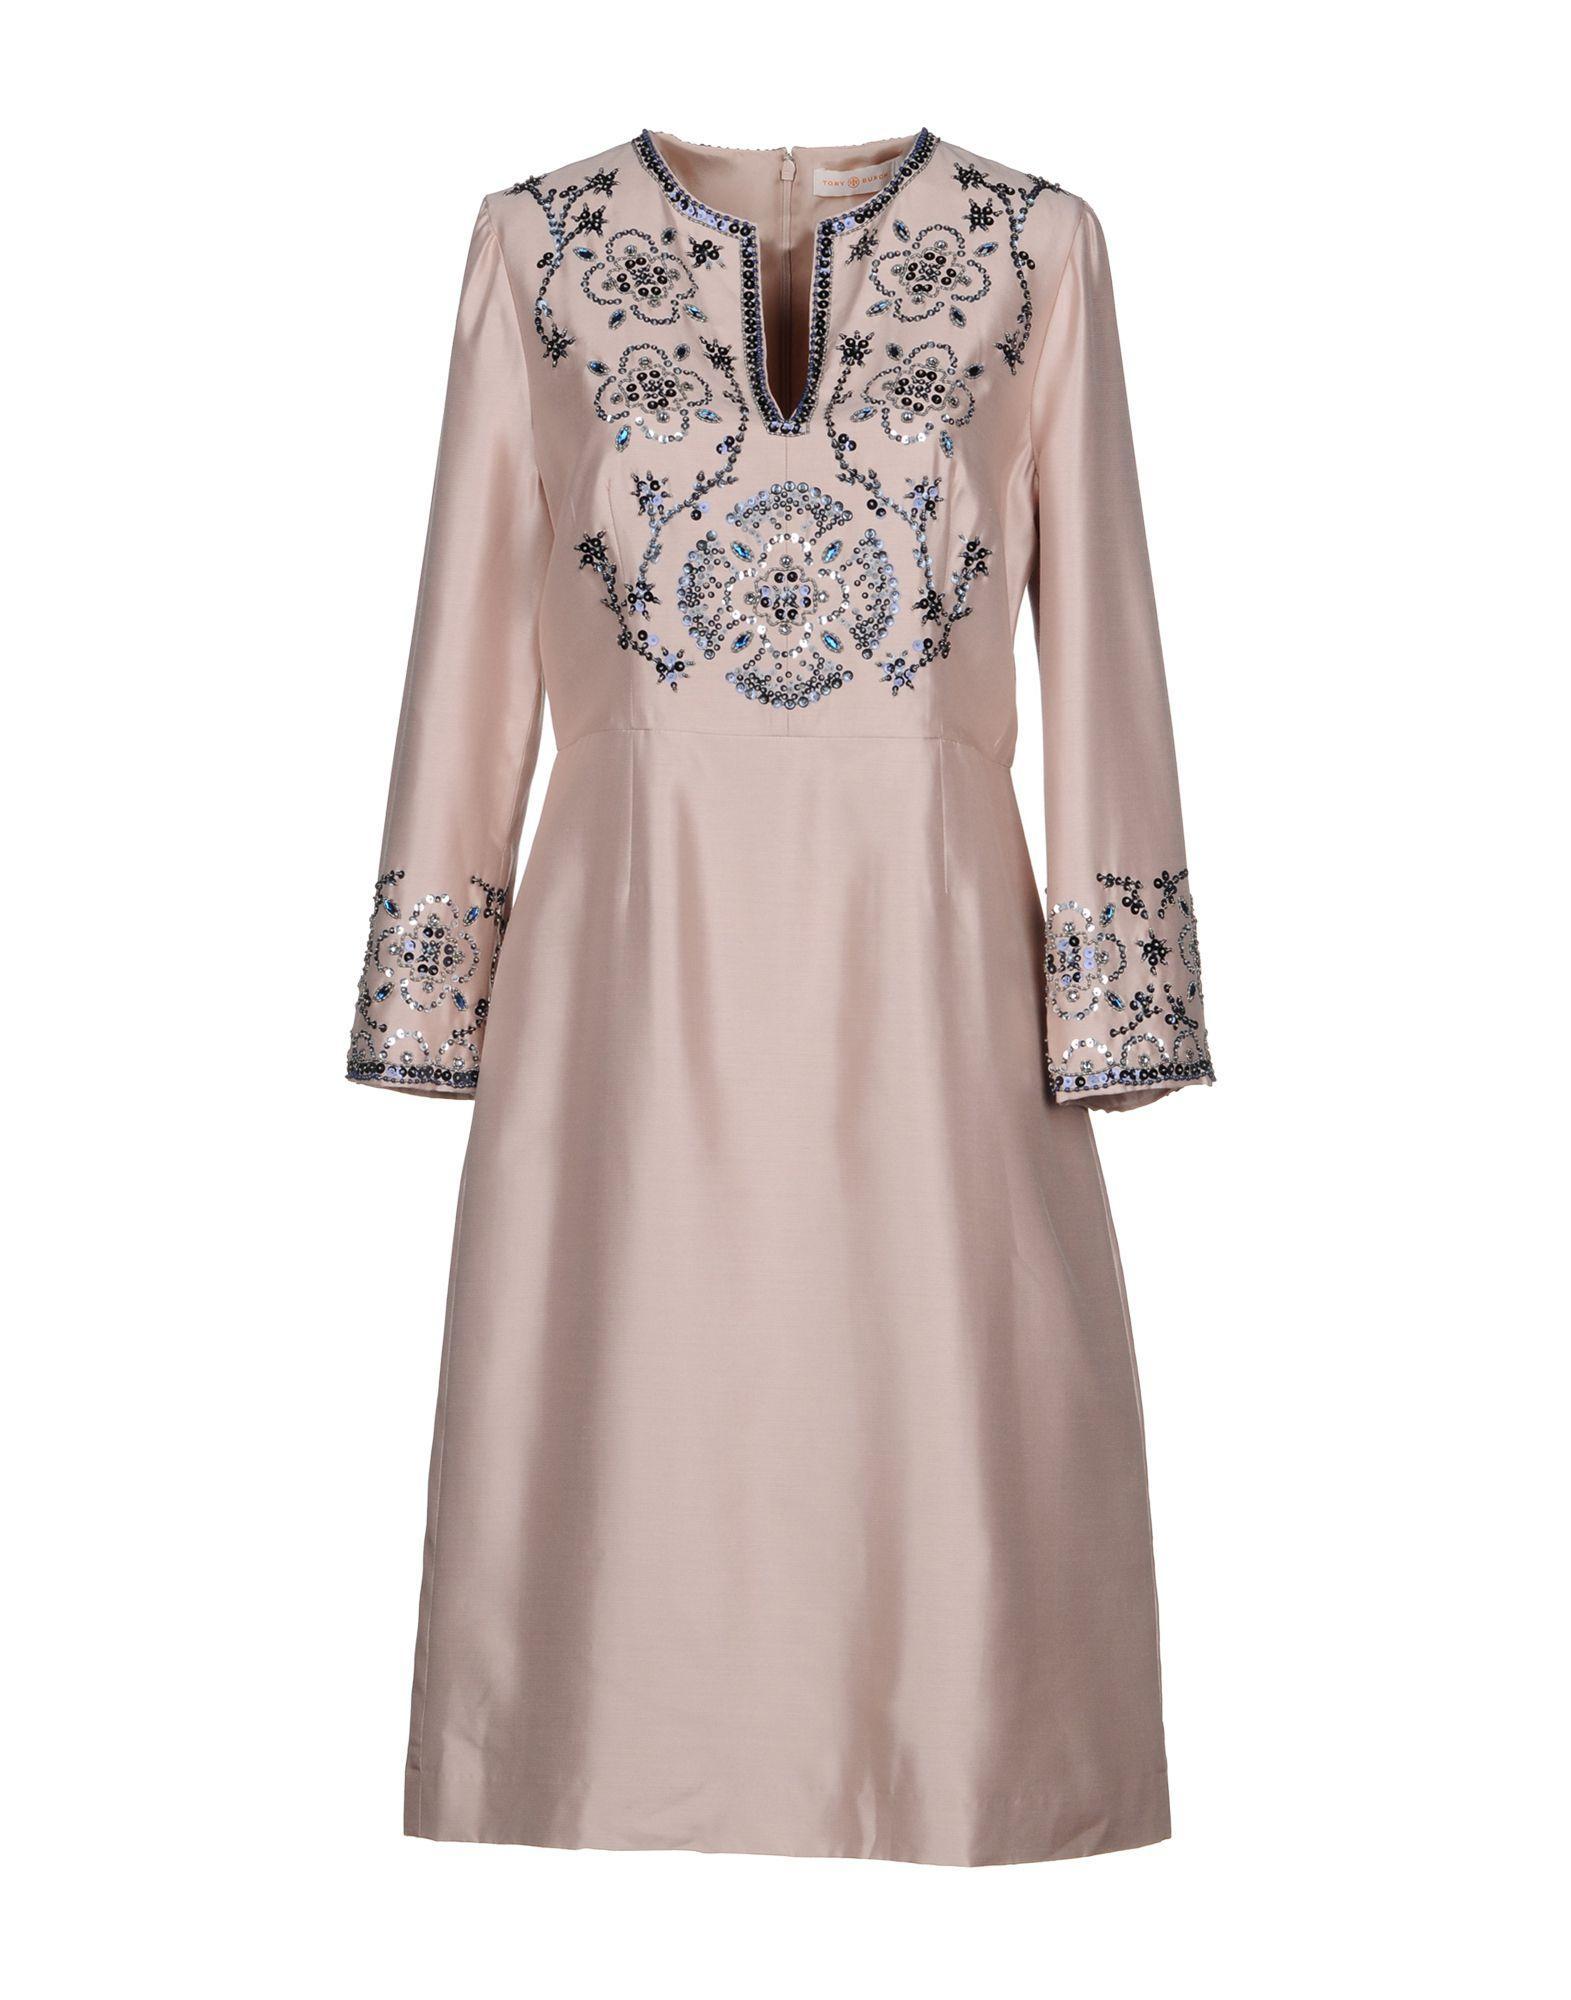 Tory Burch Formal Dress In Pink